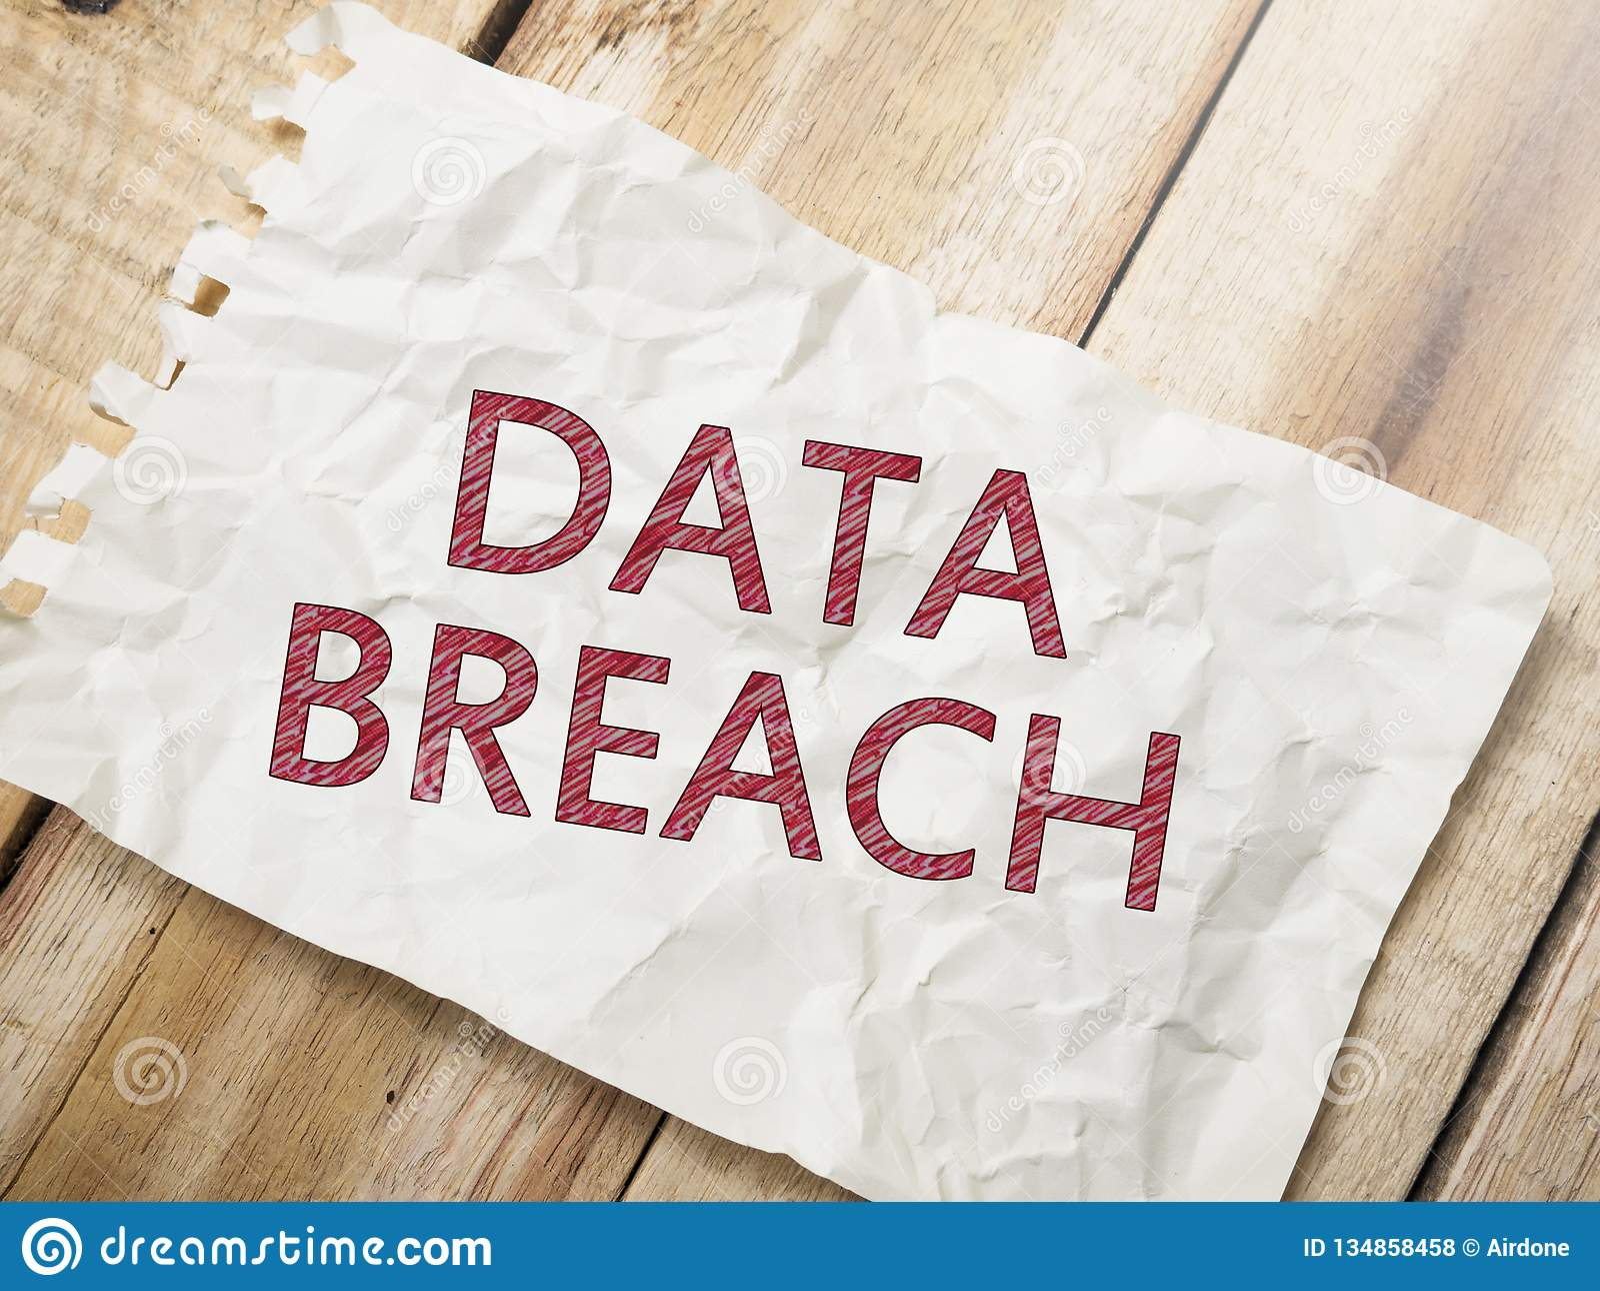 Data Breach, Internet Crime Words Concept